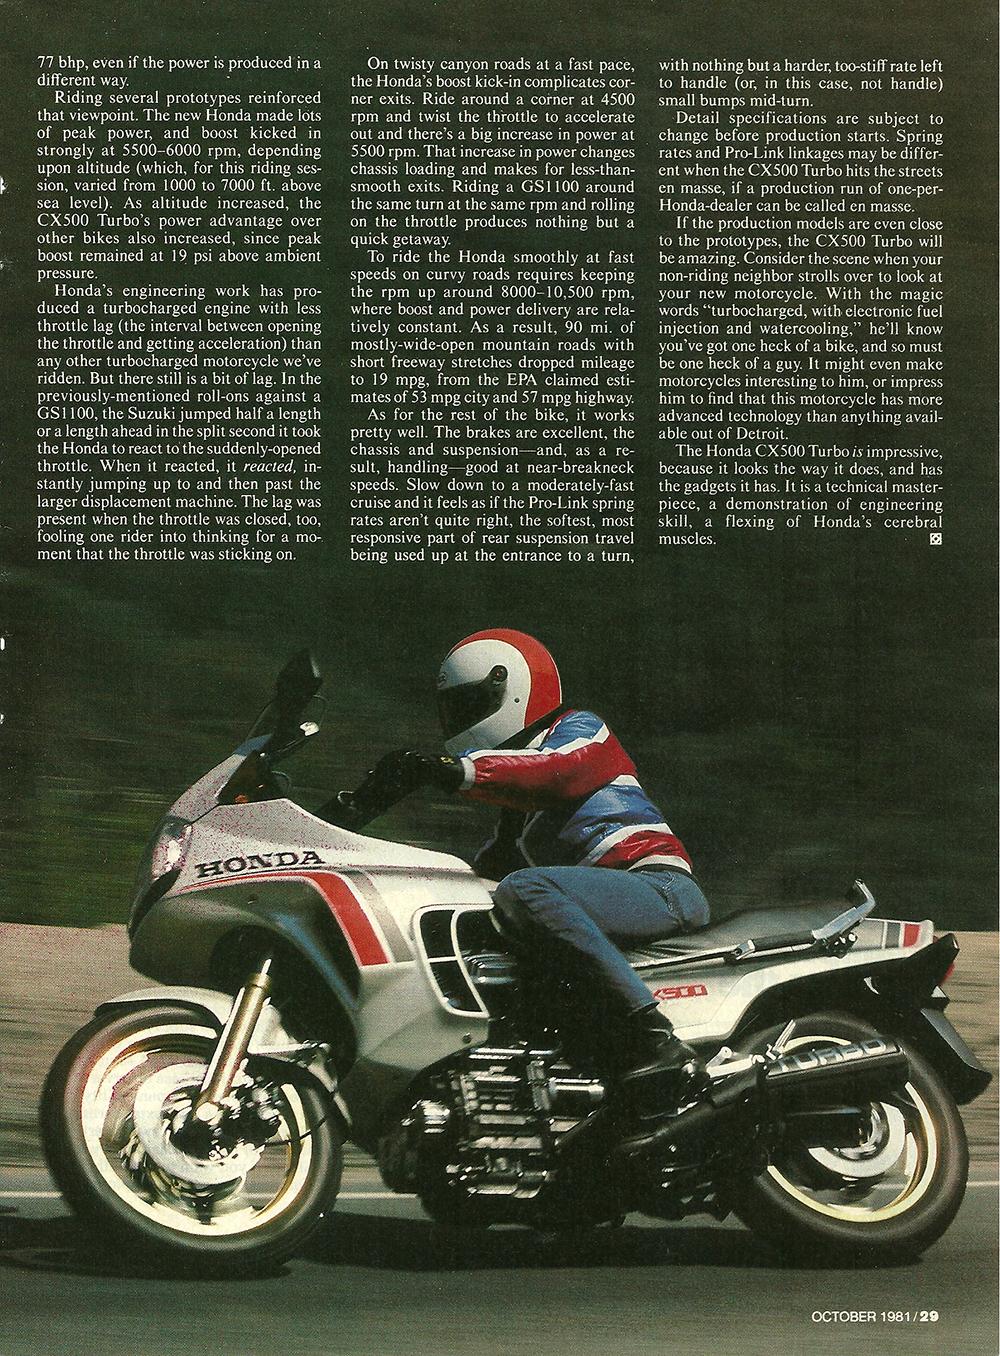 1981 Honda CX500 Turbo road test 4.jpg